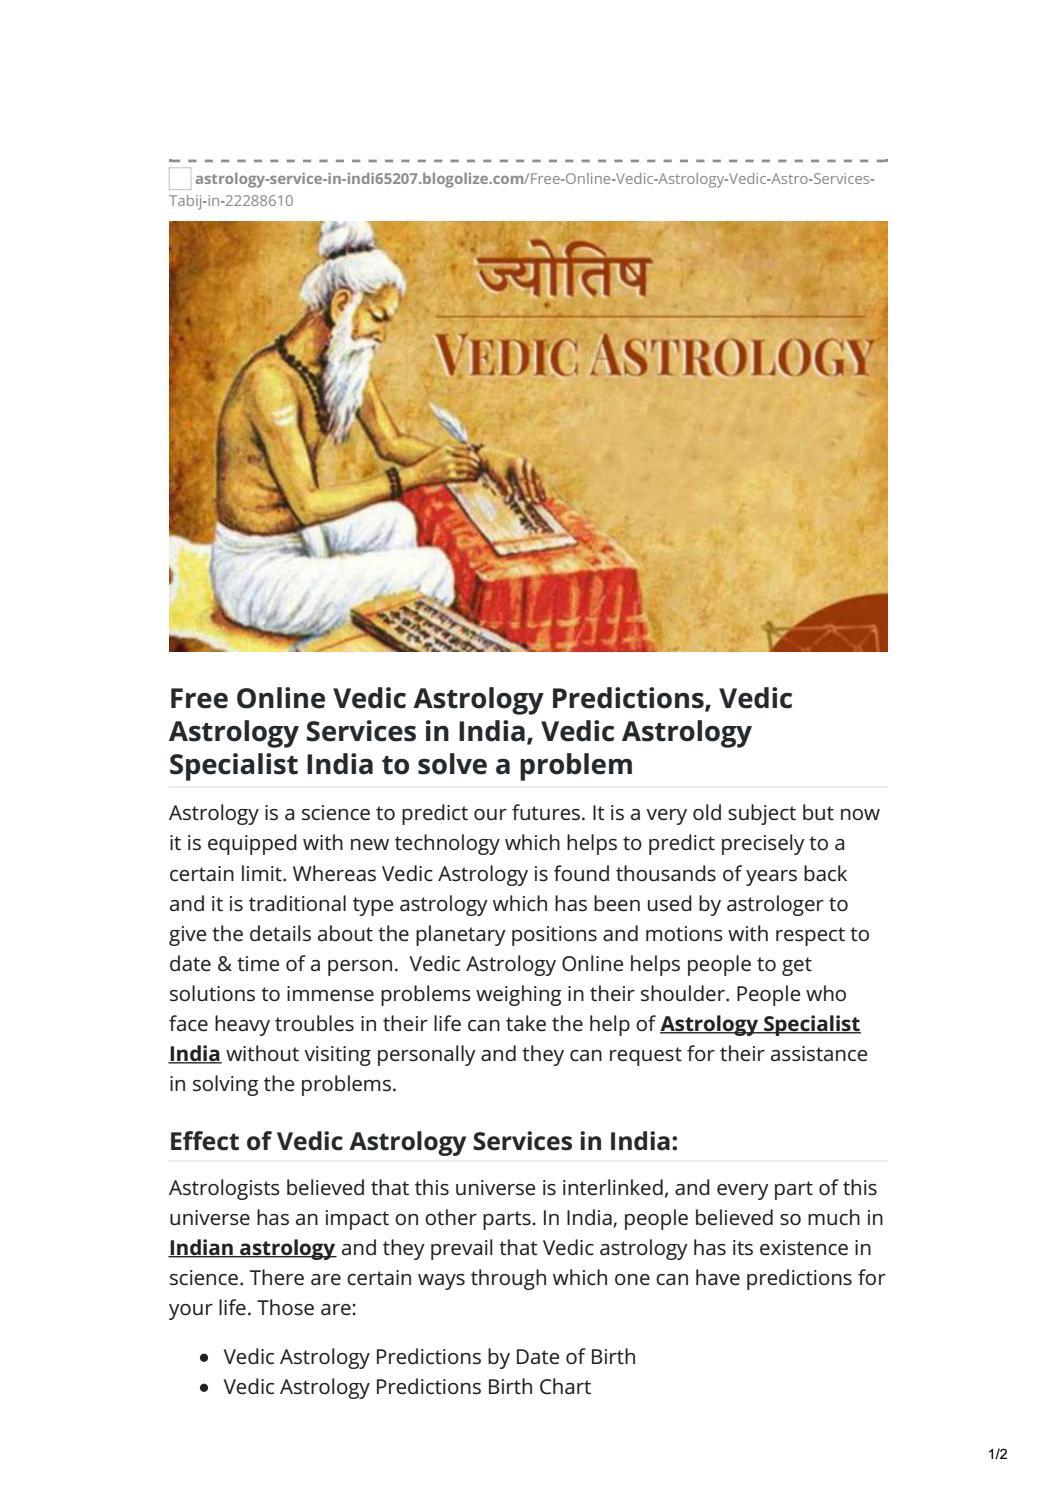 Vedic astrology websites